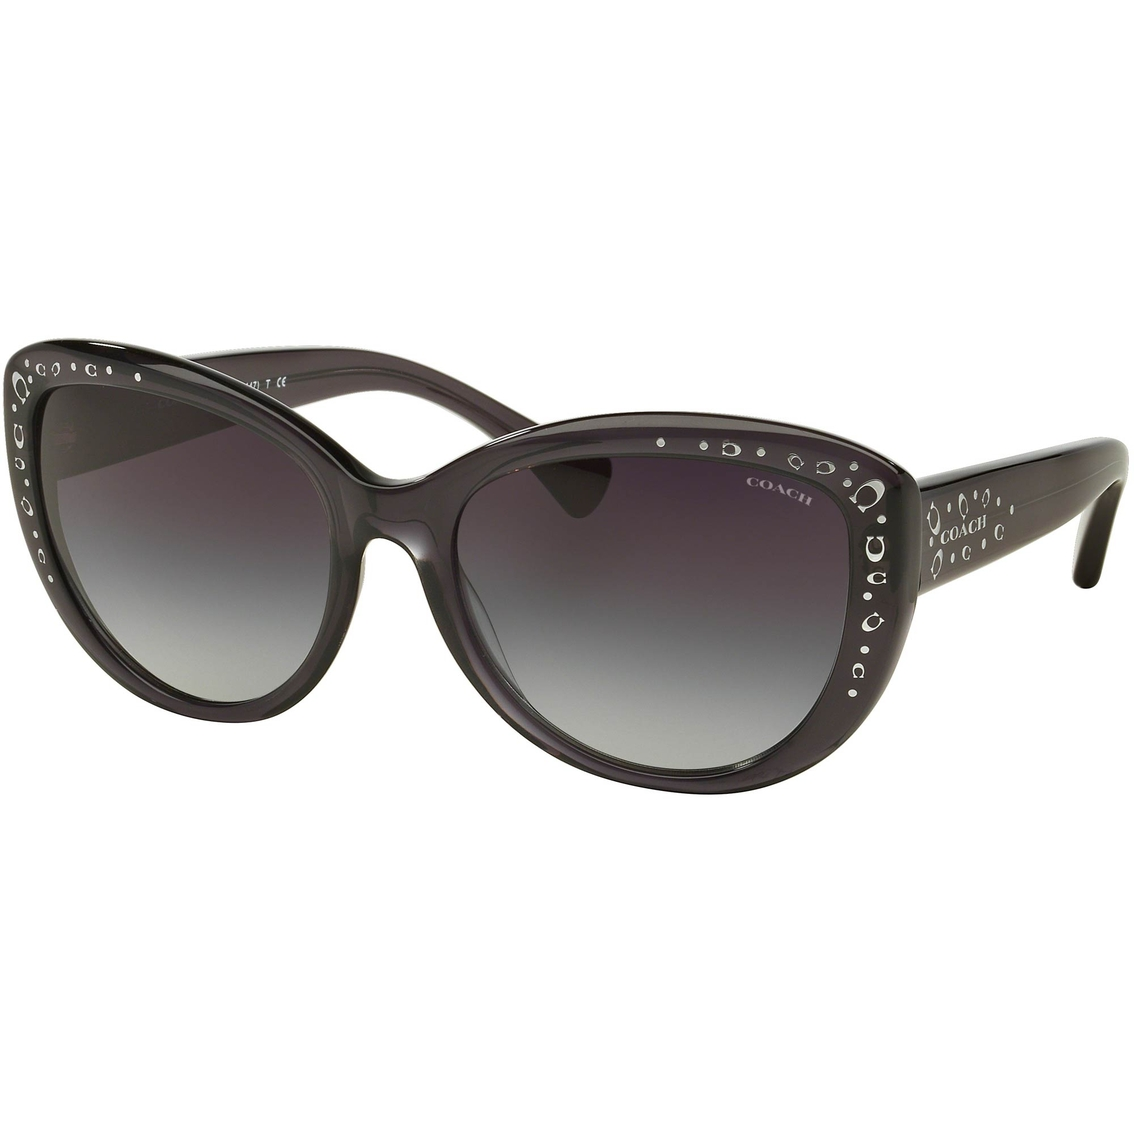 36e21aa63341 Coach Sunglasses 0hc8162 | Women's Sunglasses | Handbags ...